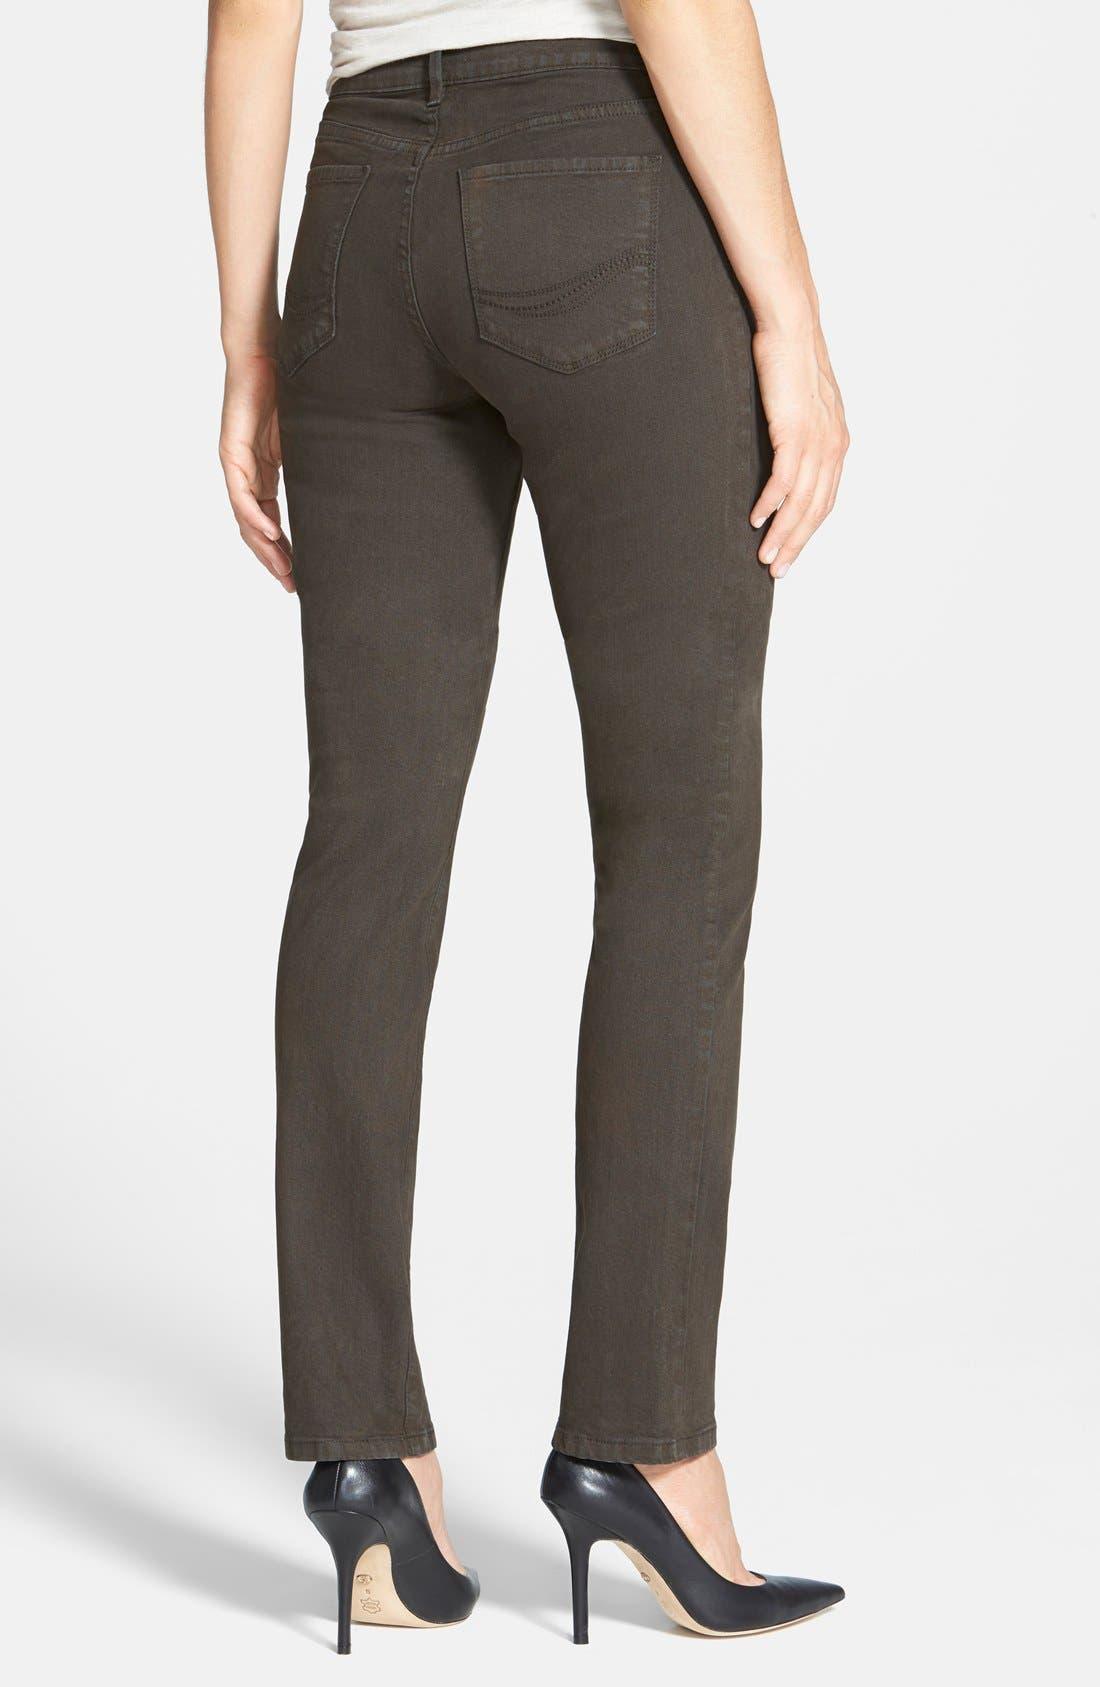 Alternate Image 2  - NYDJ Sheri Colored Stretch Skinny Jeans (Petite)